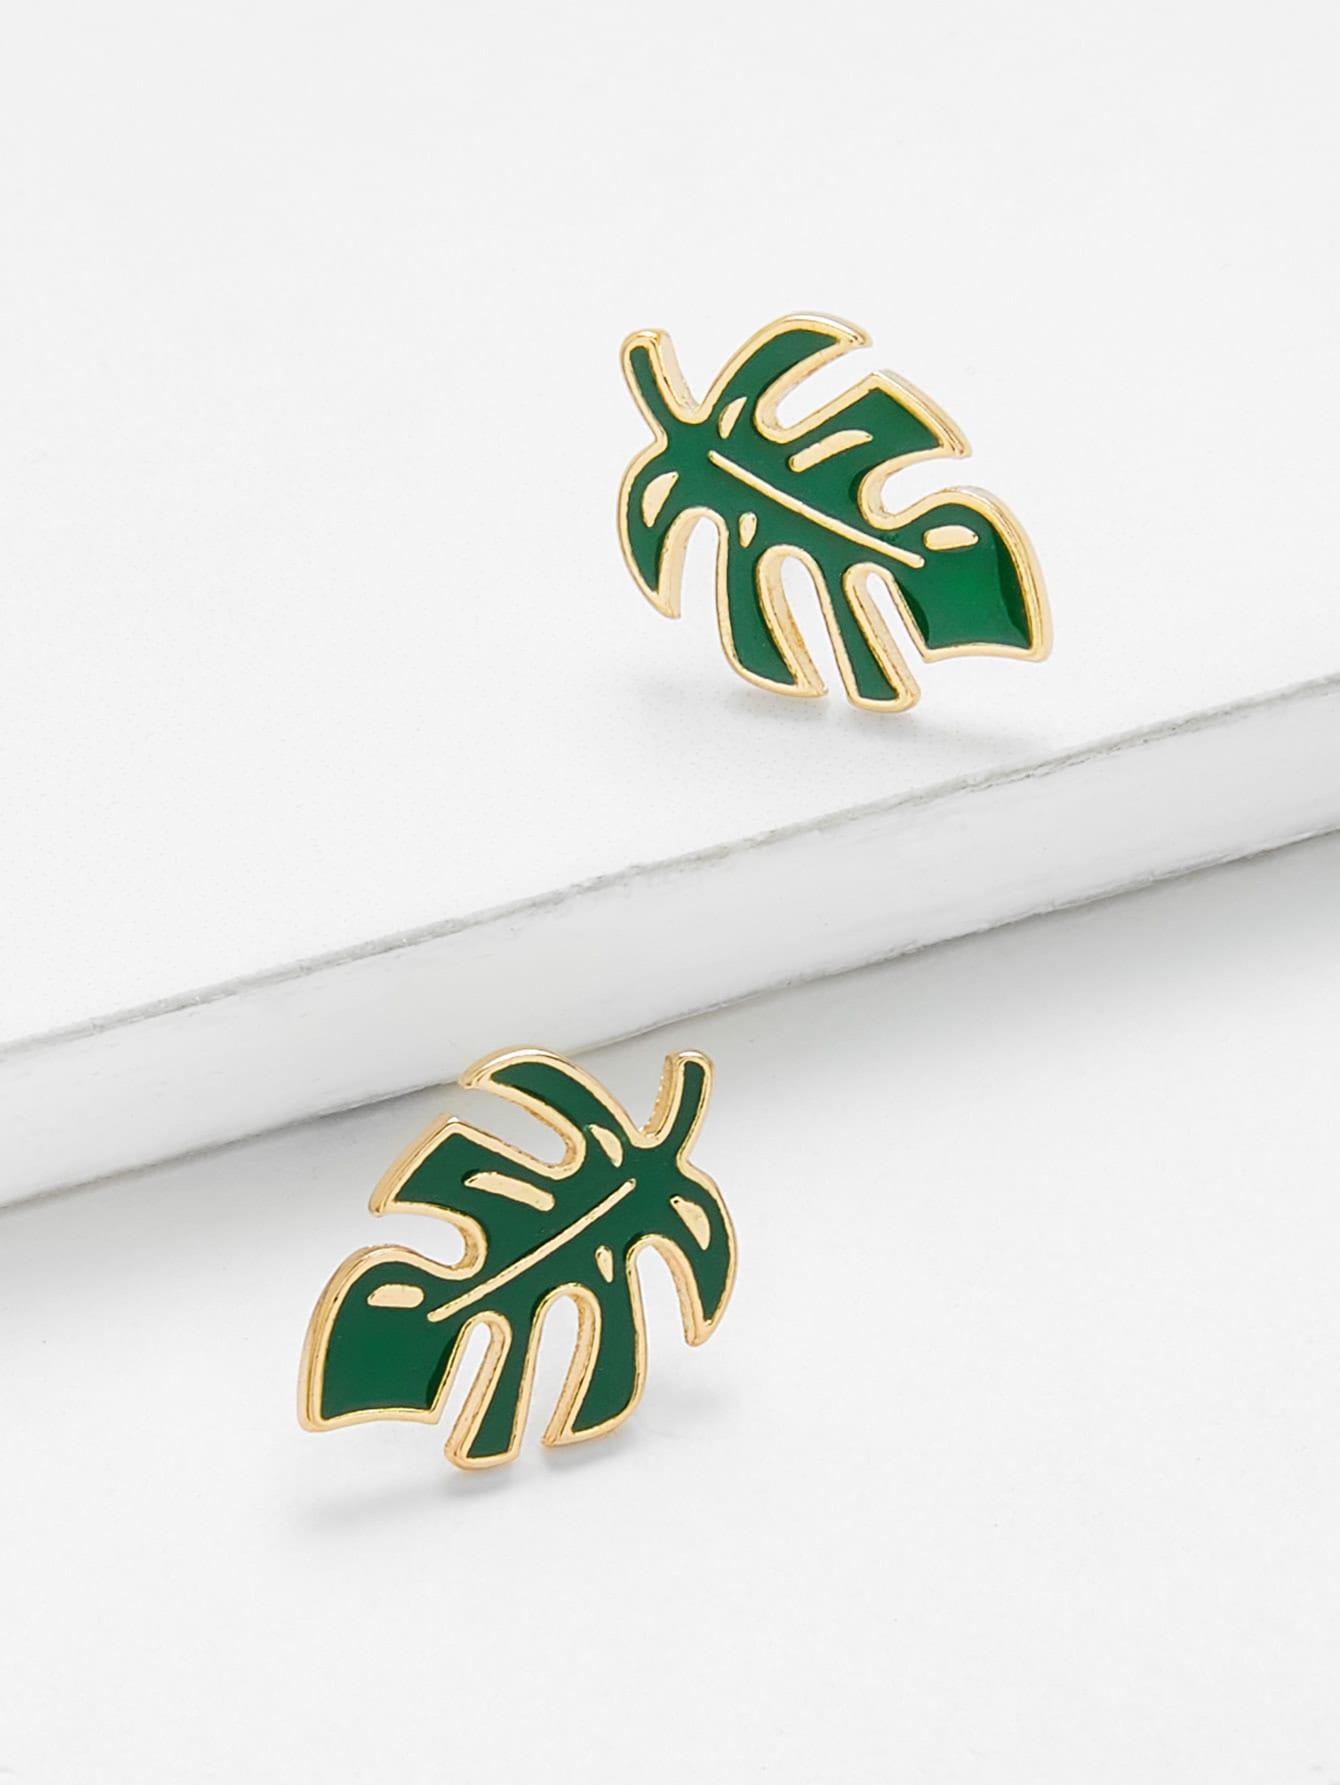 Leaf Design Stud Earrings floral leaf rhinestone stud earrings